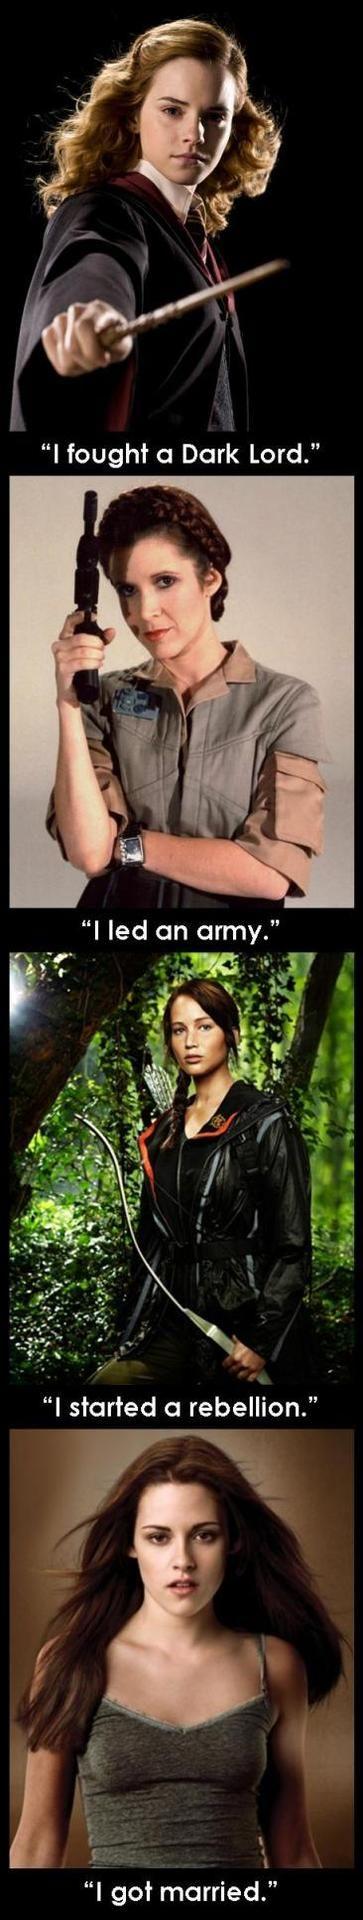 Ahhh. Isn't Bella just so inspirational?